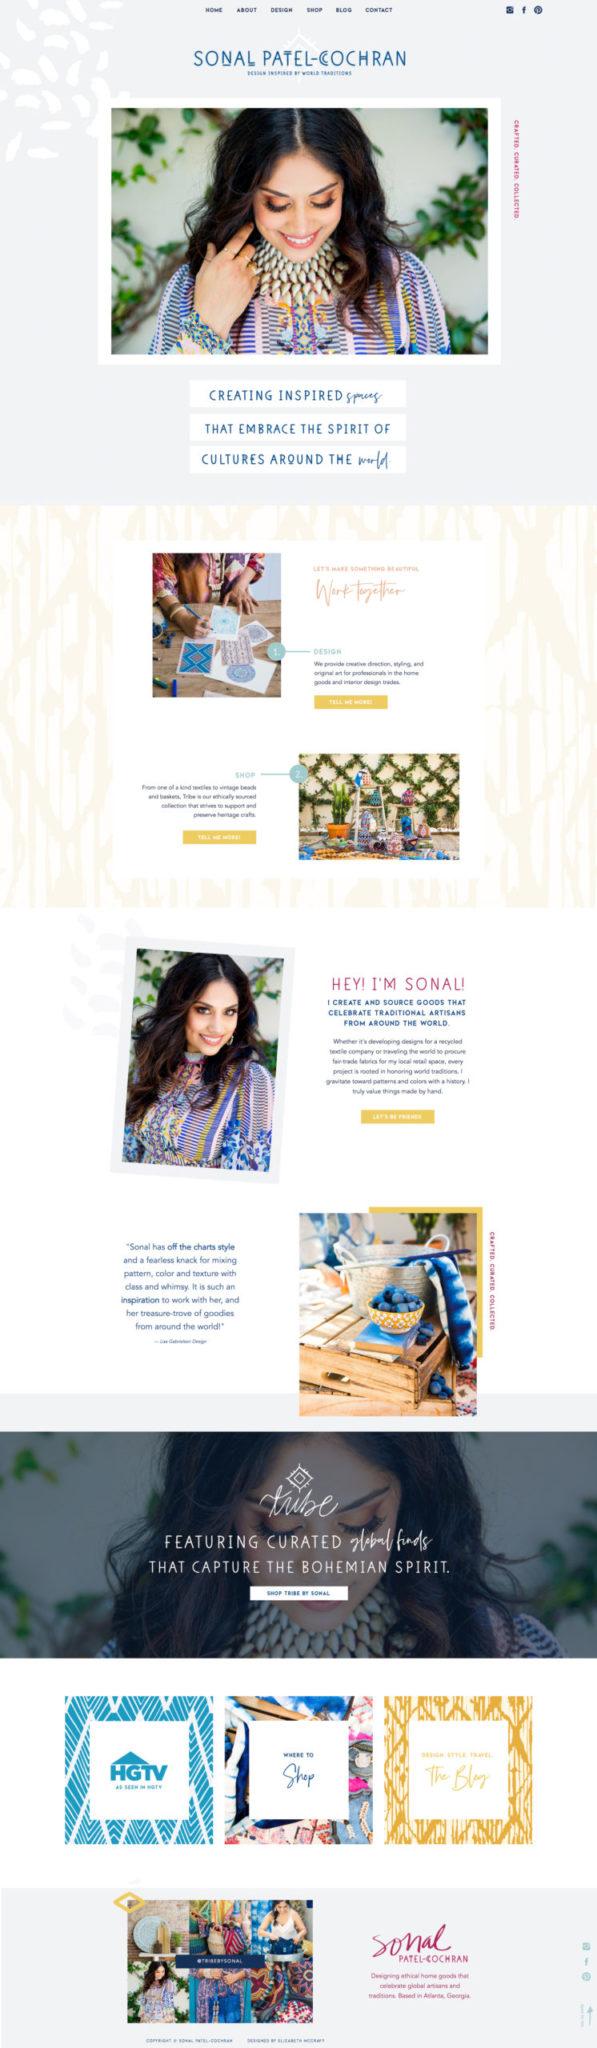 Home-Sonal-Patel-Cochran-Updated